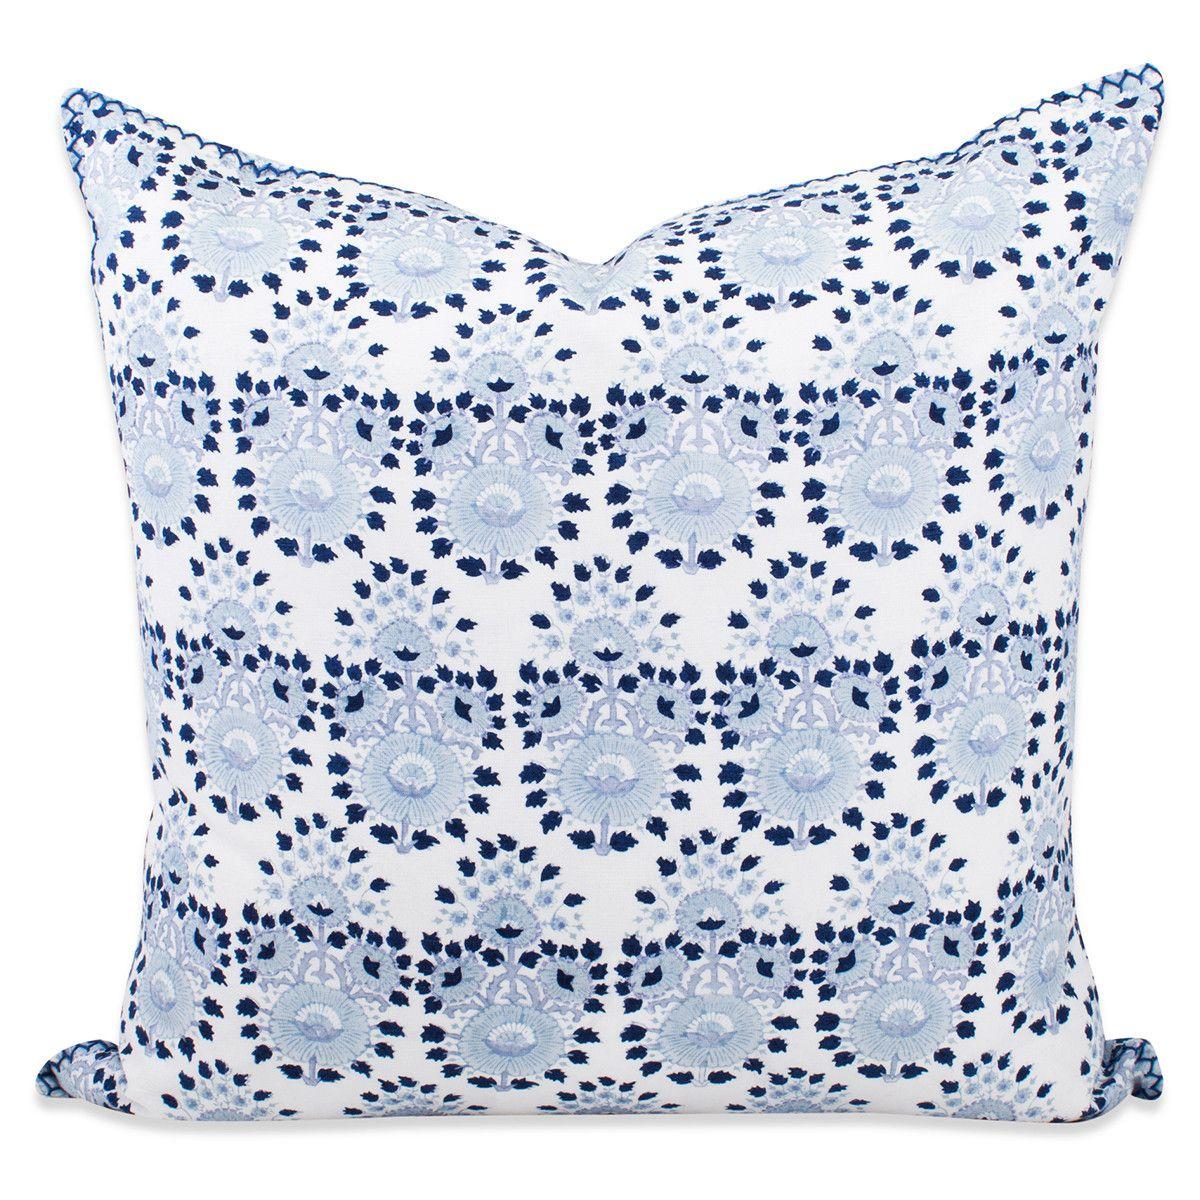 john robshaw diwan pillow indian textiles